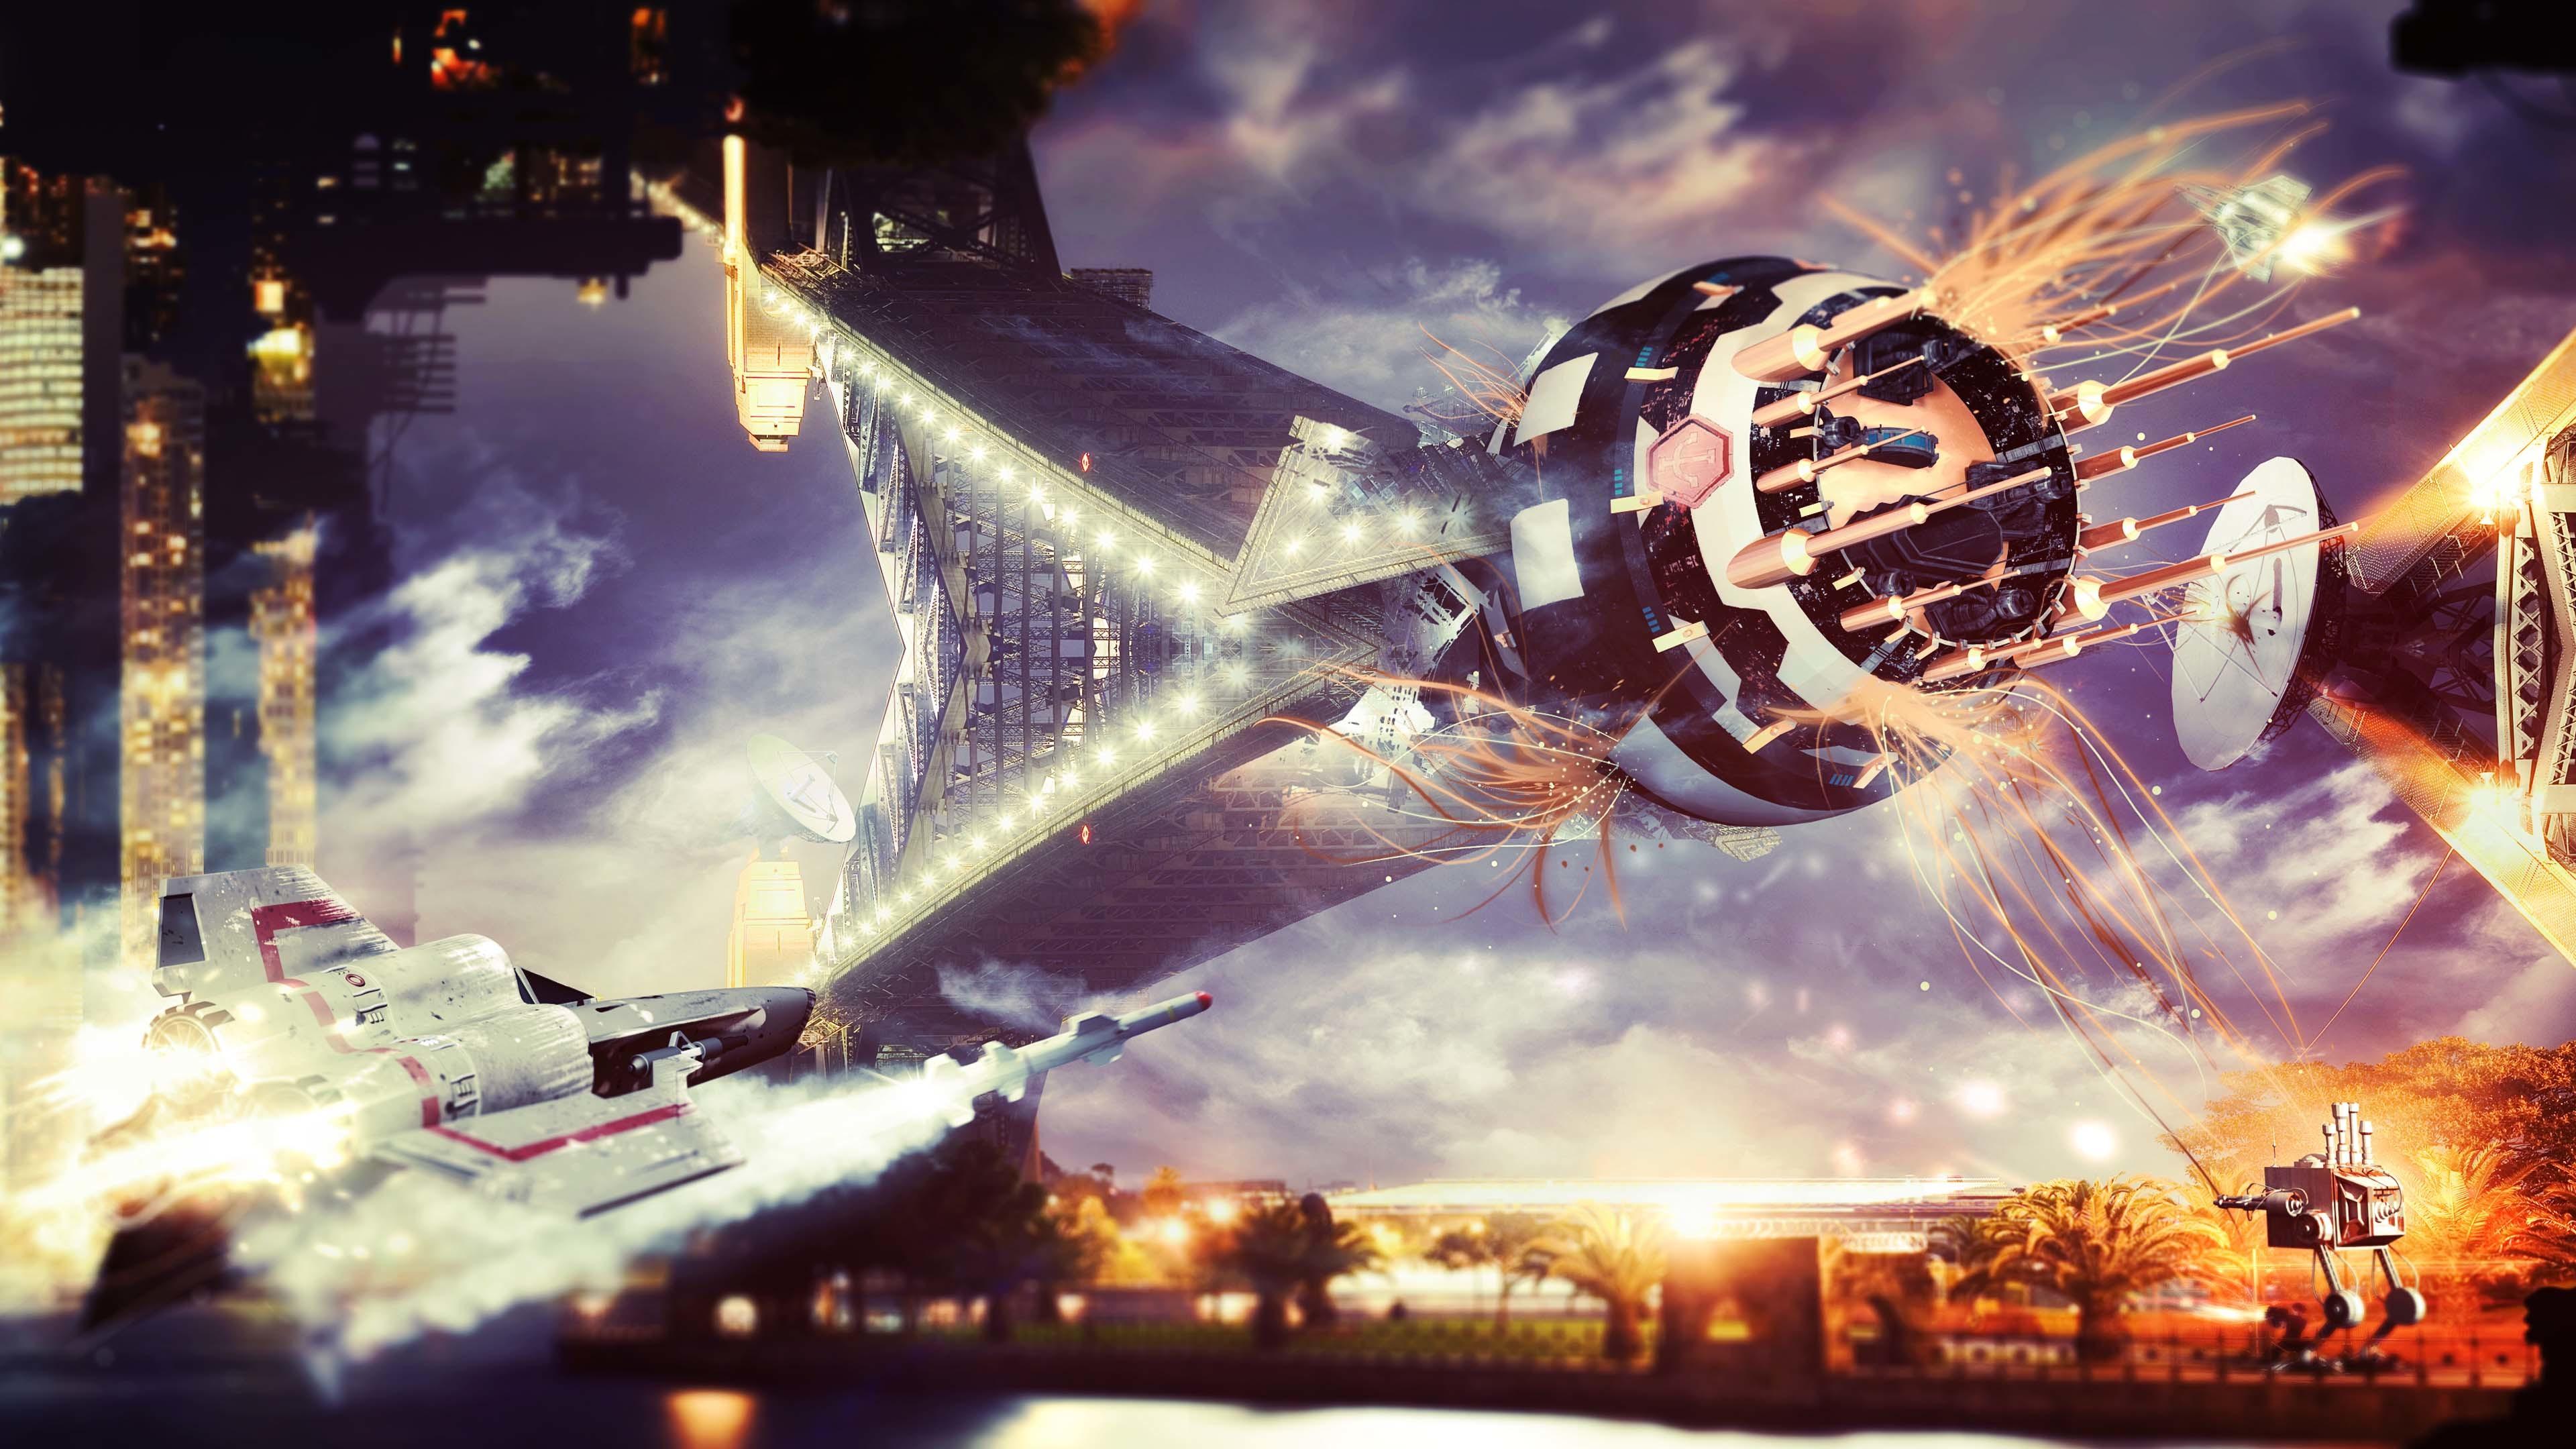 4K Sci Fi Wallpaper (47+ Images